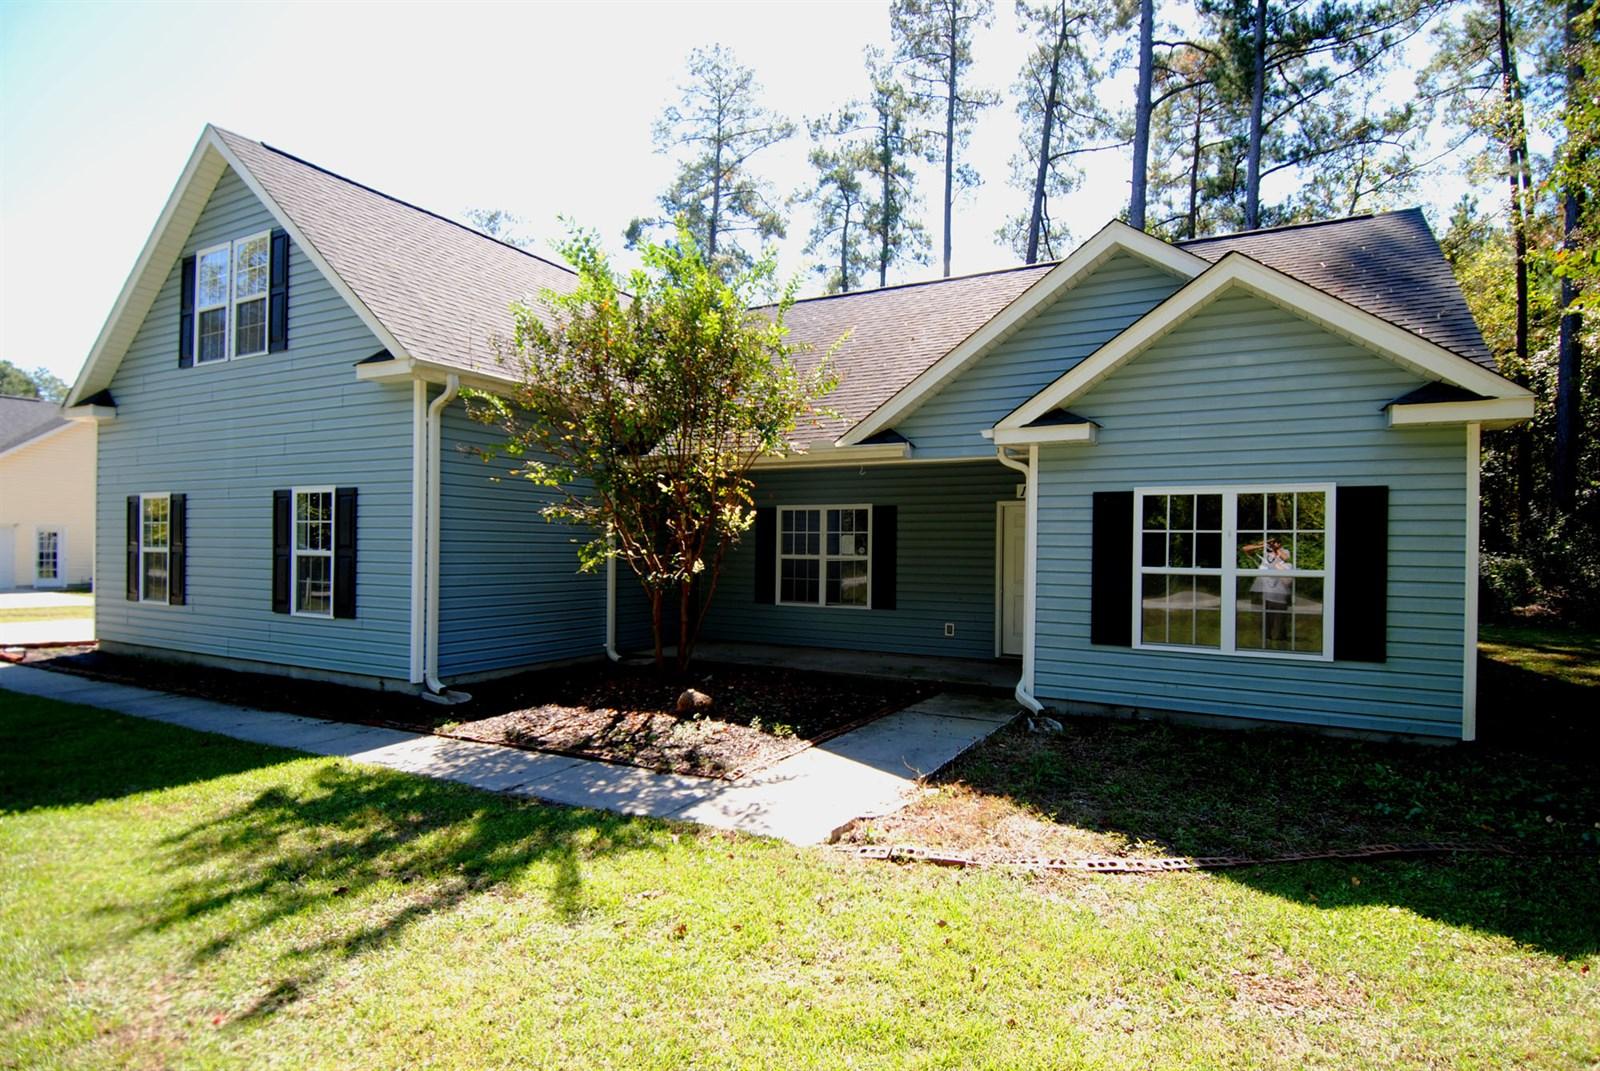 1253 Old Fayetteville Rd Ne, Leland, NC 28451